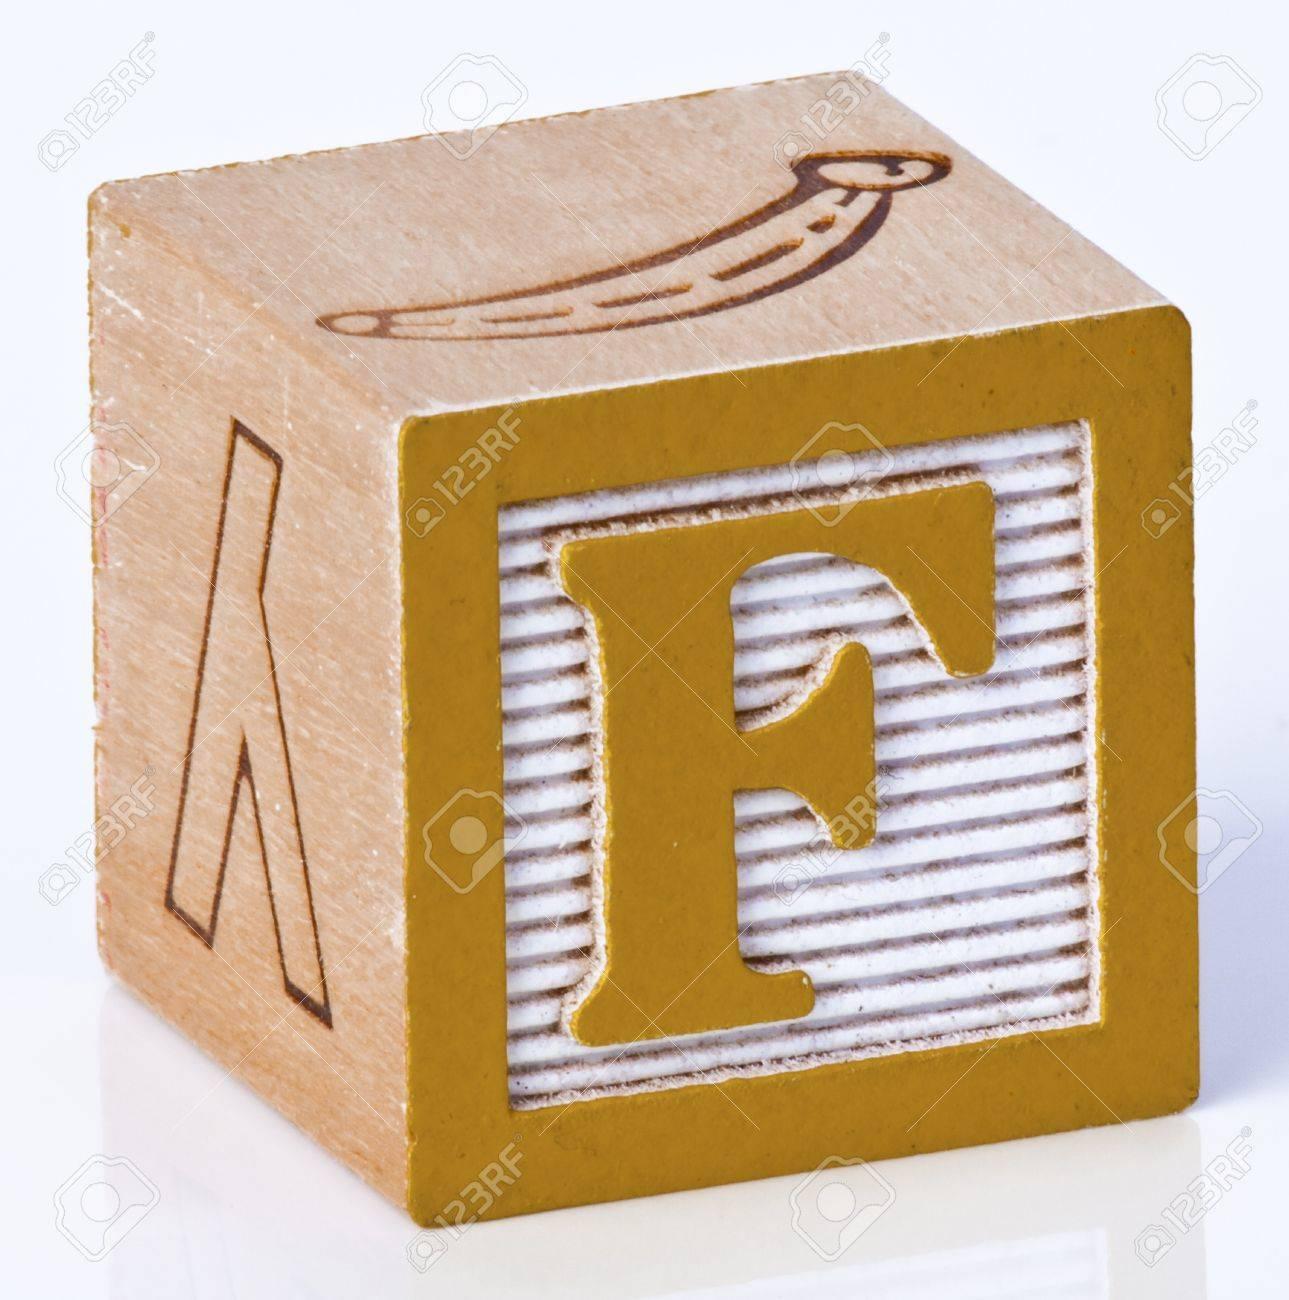 Wooden Block Letter F Stock Photo - 7043423